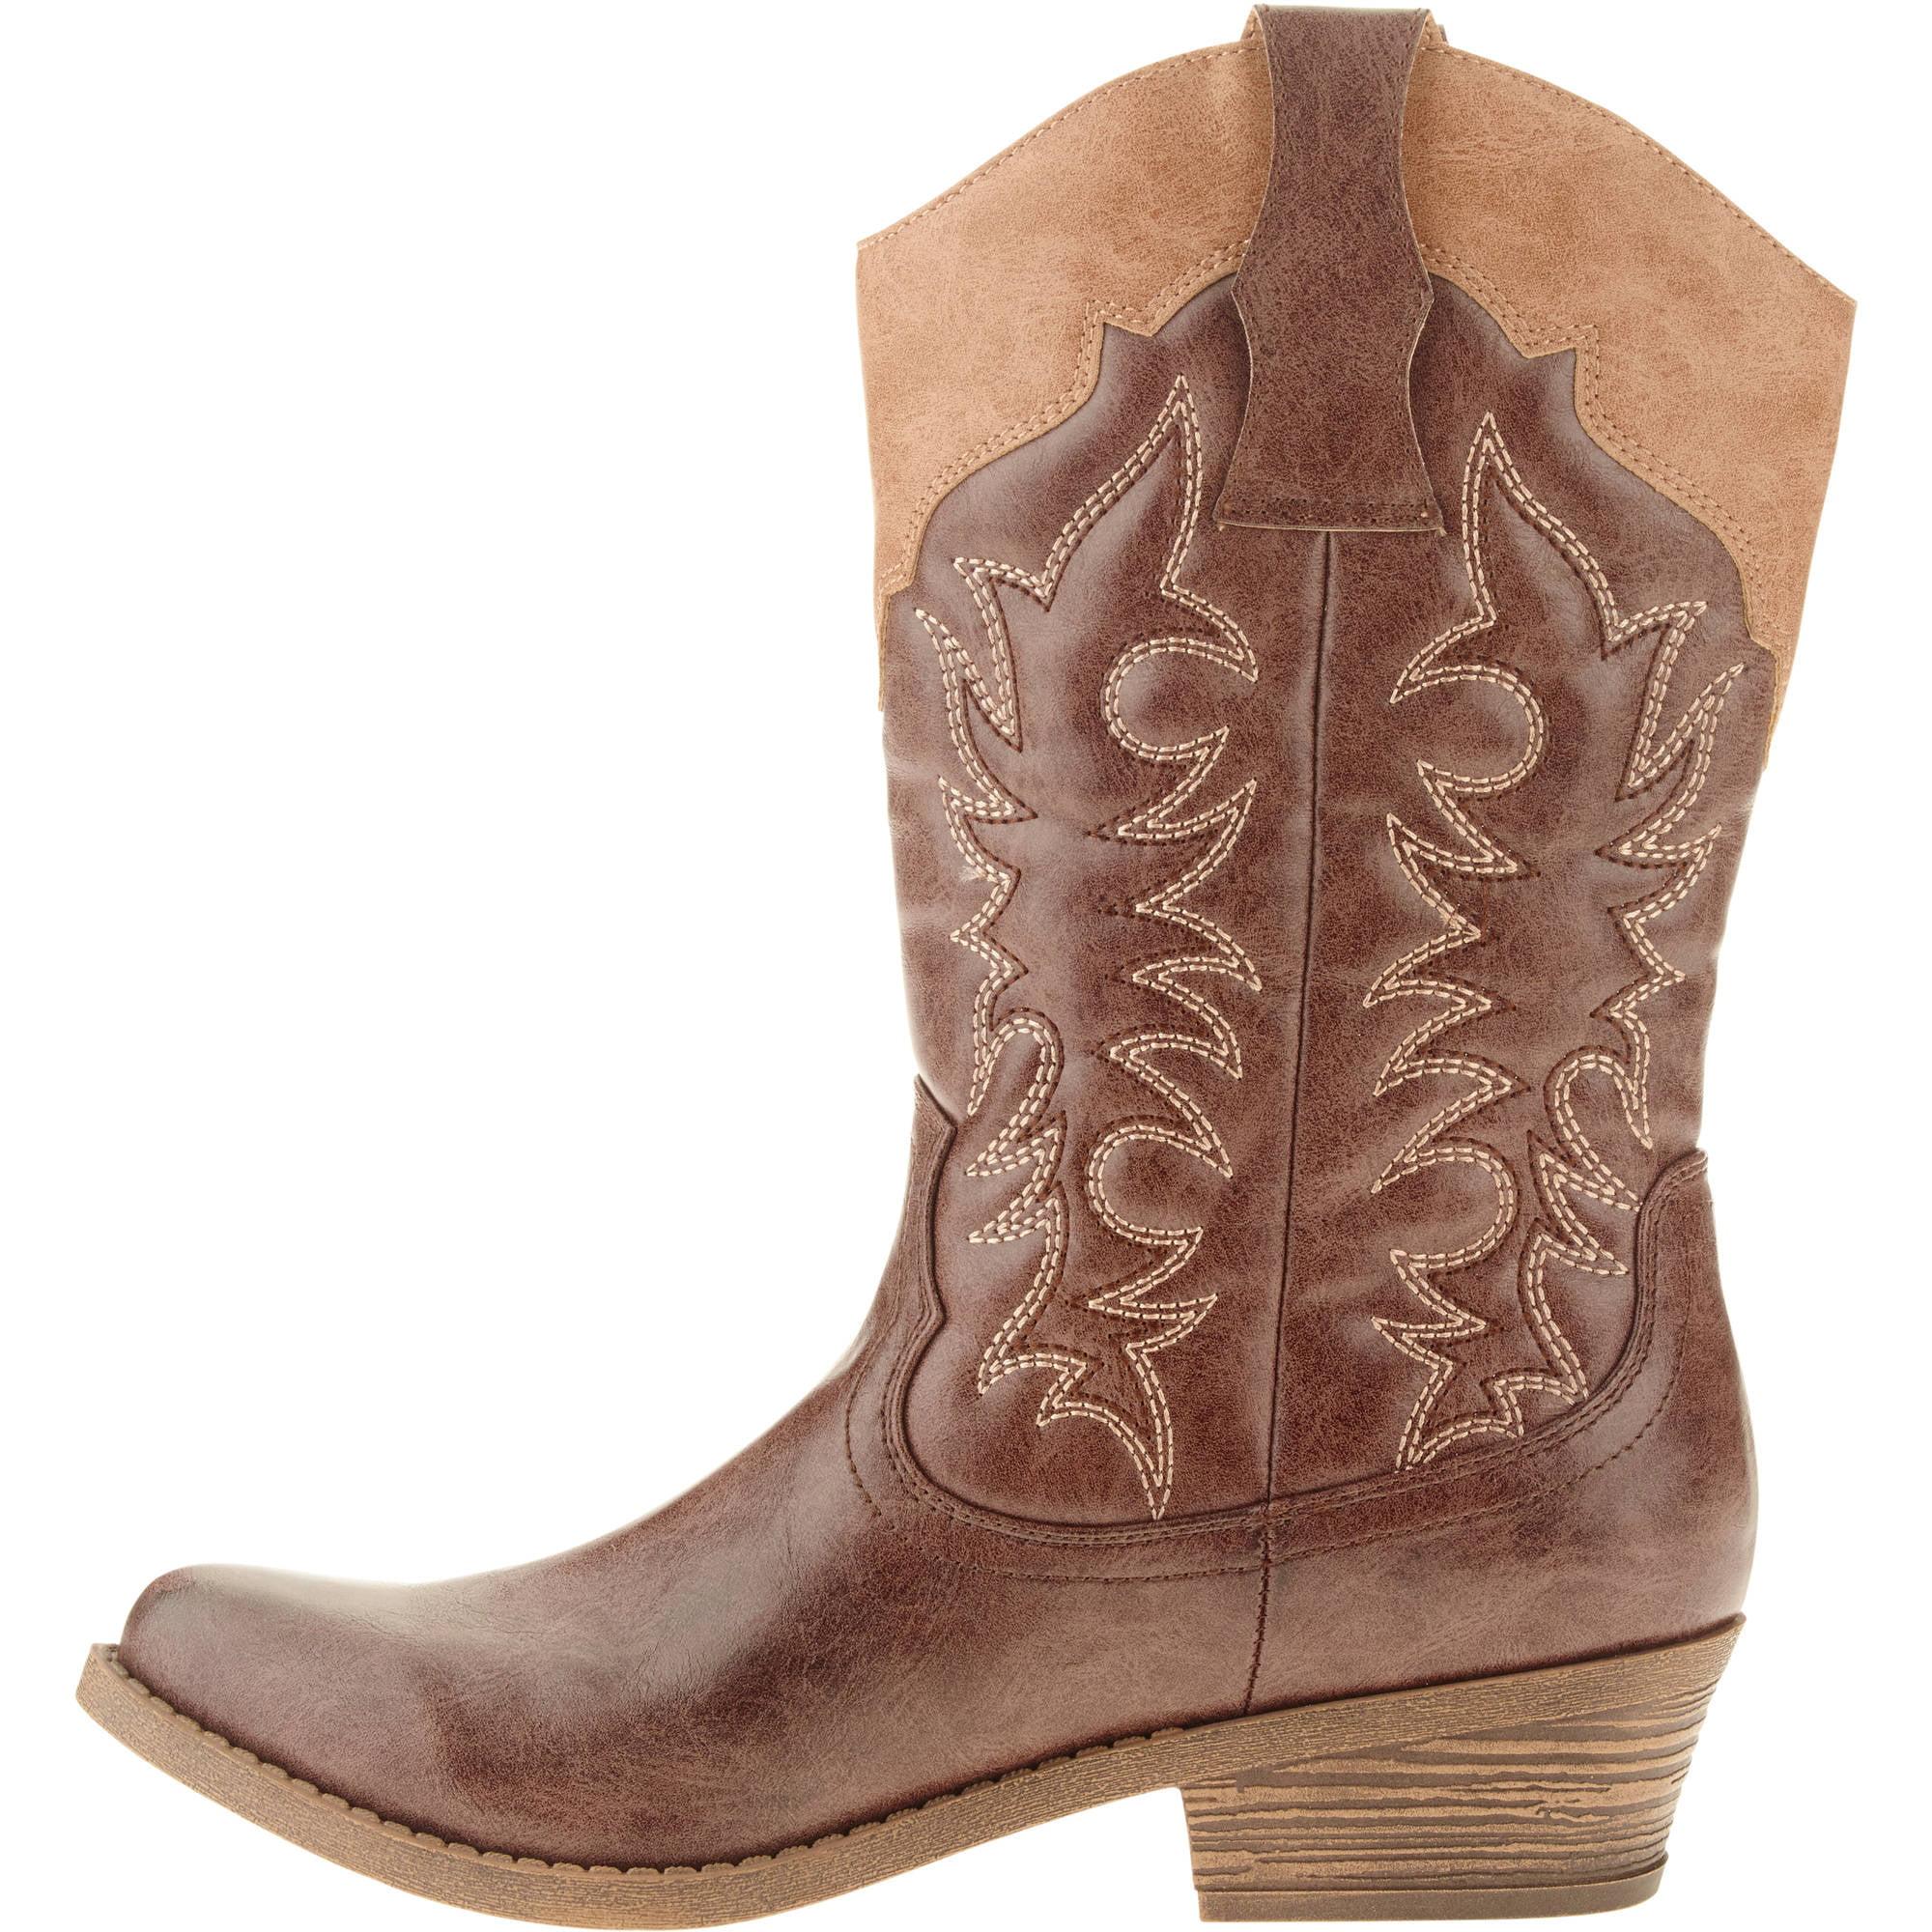 Faded Glory - Faded Glory Women s Fashion Cowboy Boot - Walmart.com e5e7ac33d3e